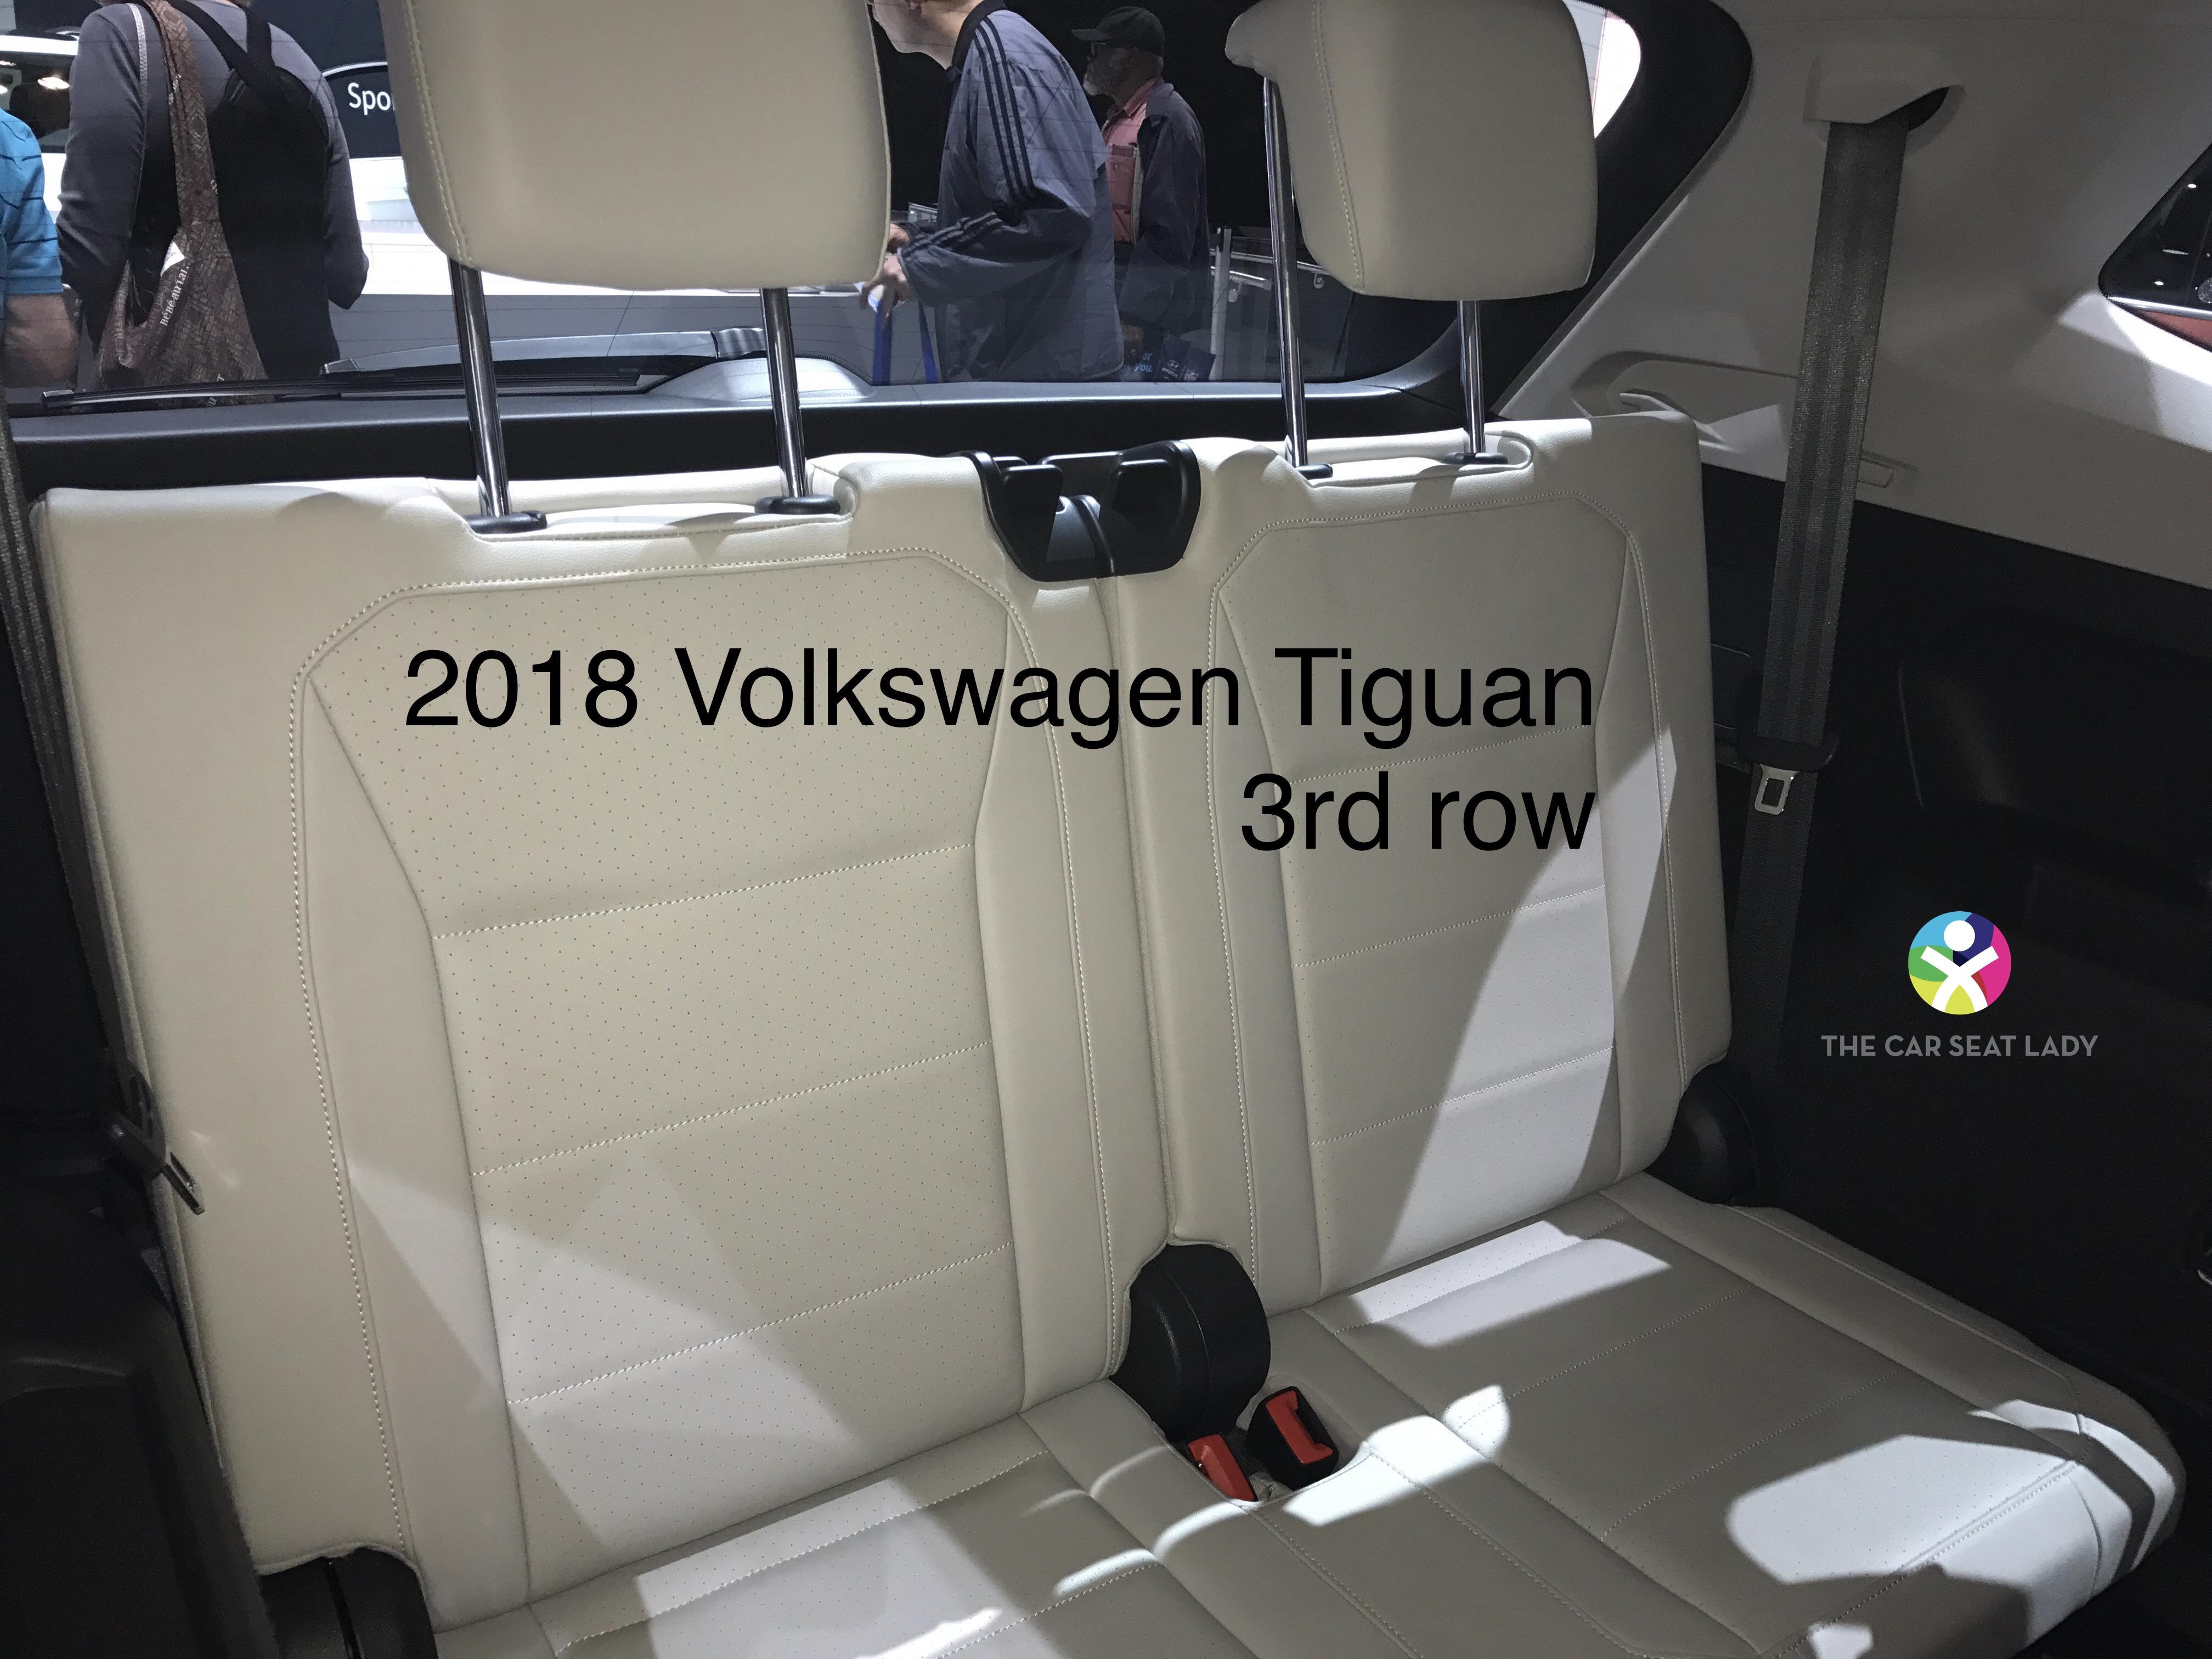 The Car Seat Lady – Volkswagen Tiguan